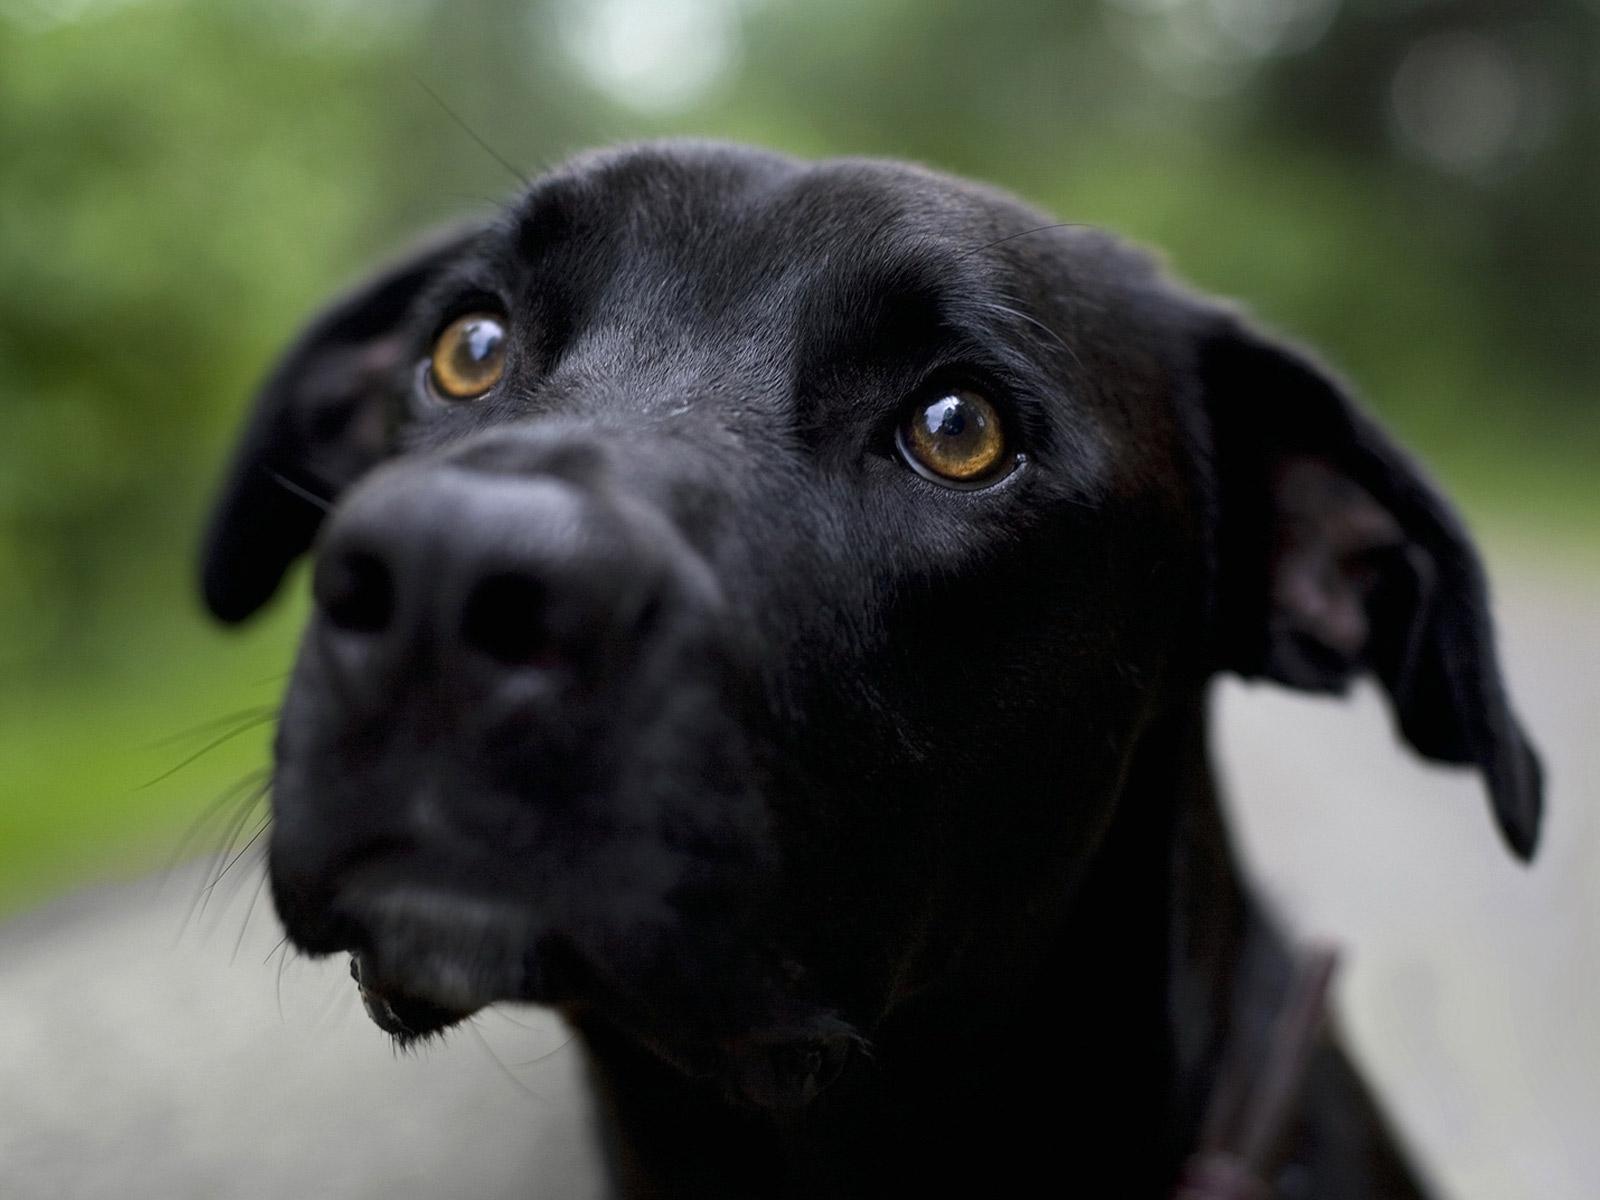 cute plott hound dog - photo #12